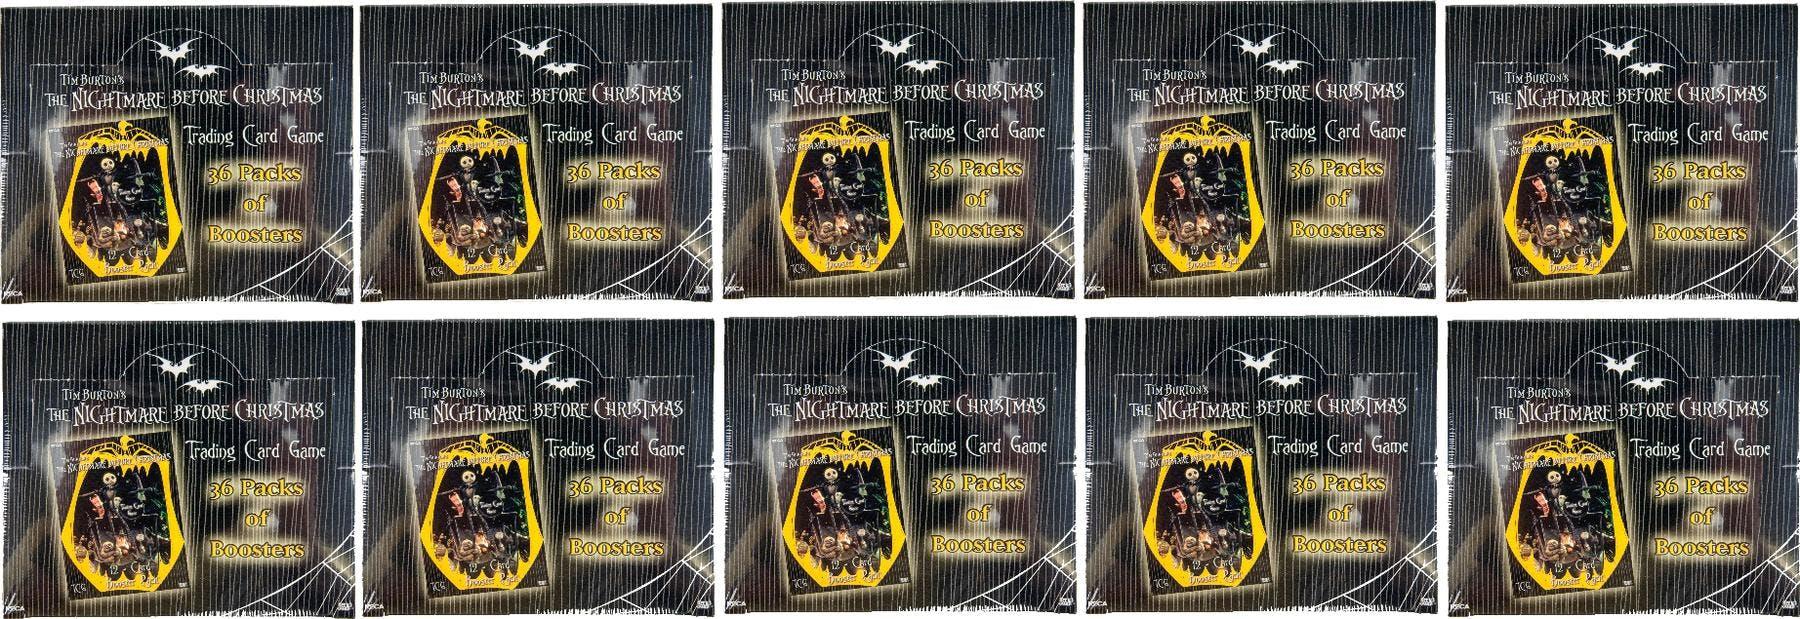 Nightmare Before Christmas TCG Booster Box Lot of 10   DA Card World